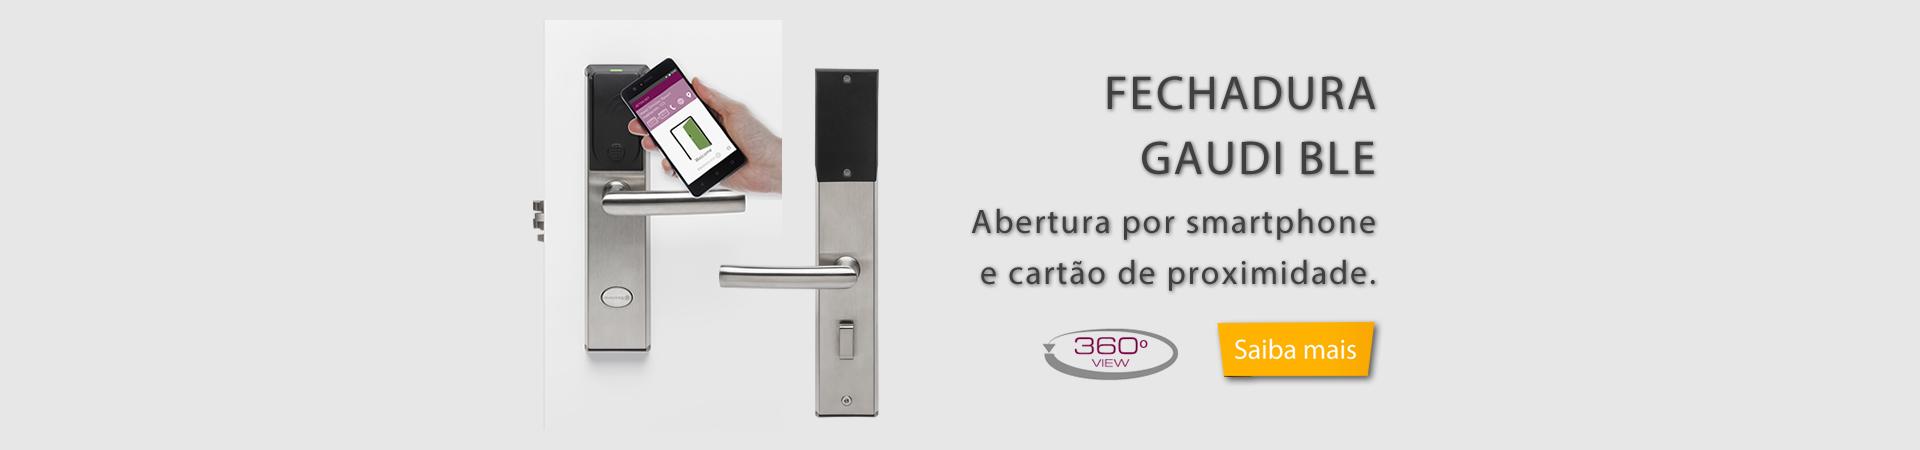 FECHADURA ELETRÔNICA GAUDI BLE